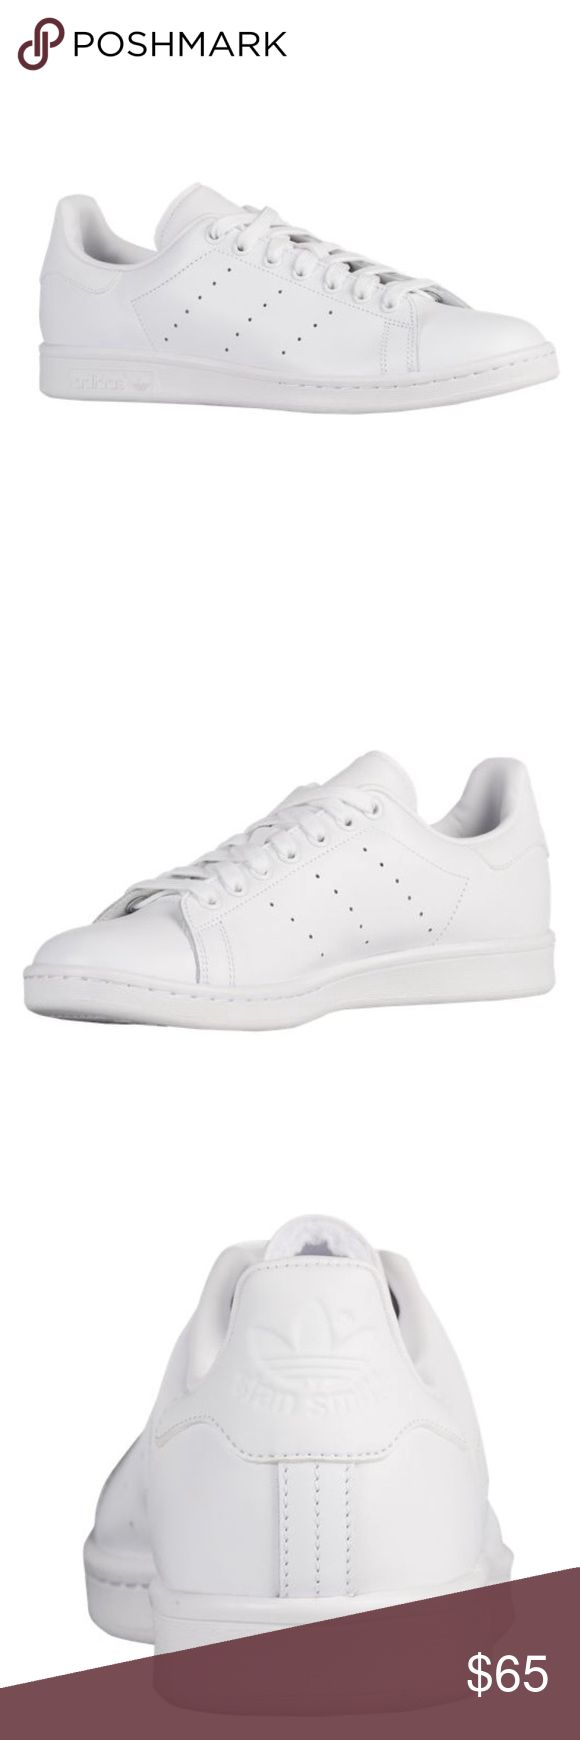 Adidas Stan Smith all white shoes All white Adidas Originals Stan Smith Adidas Shoes Sneakers